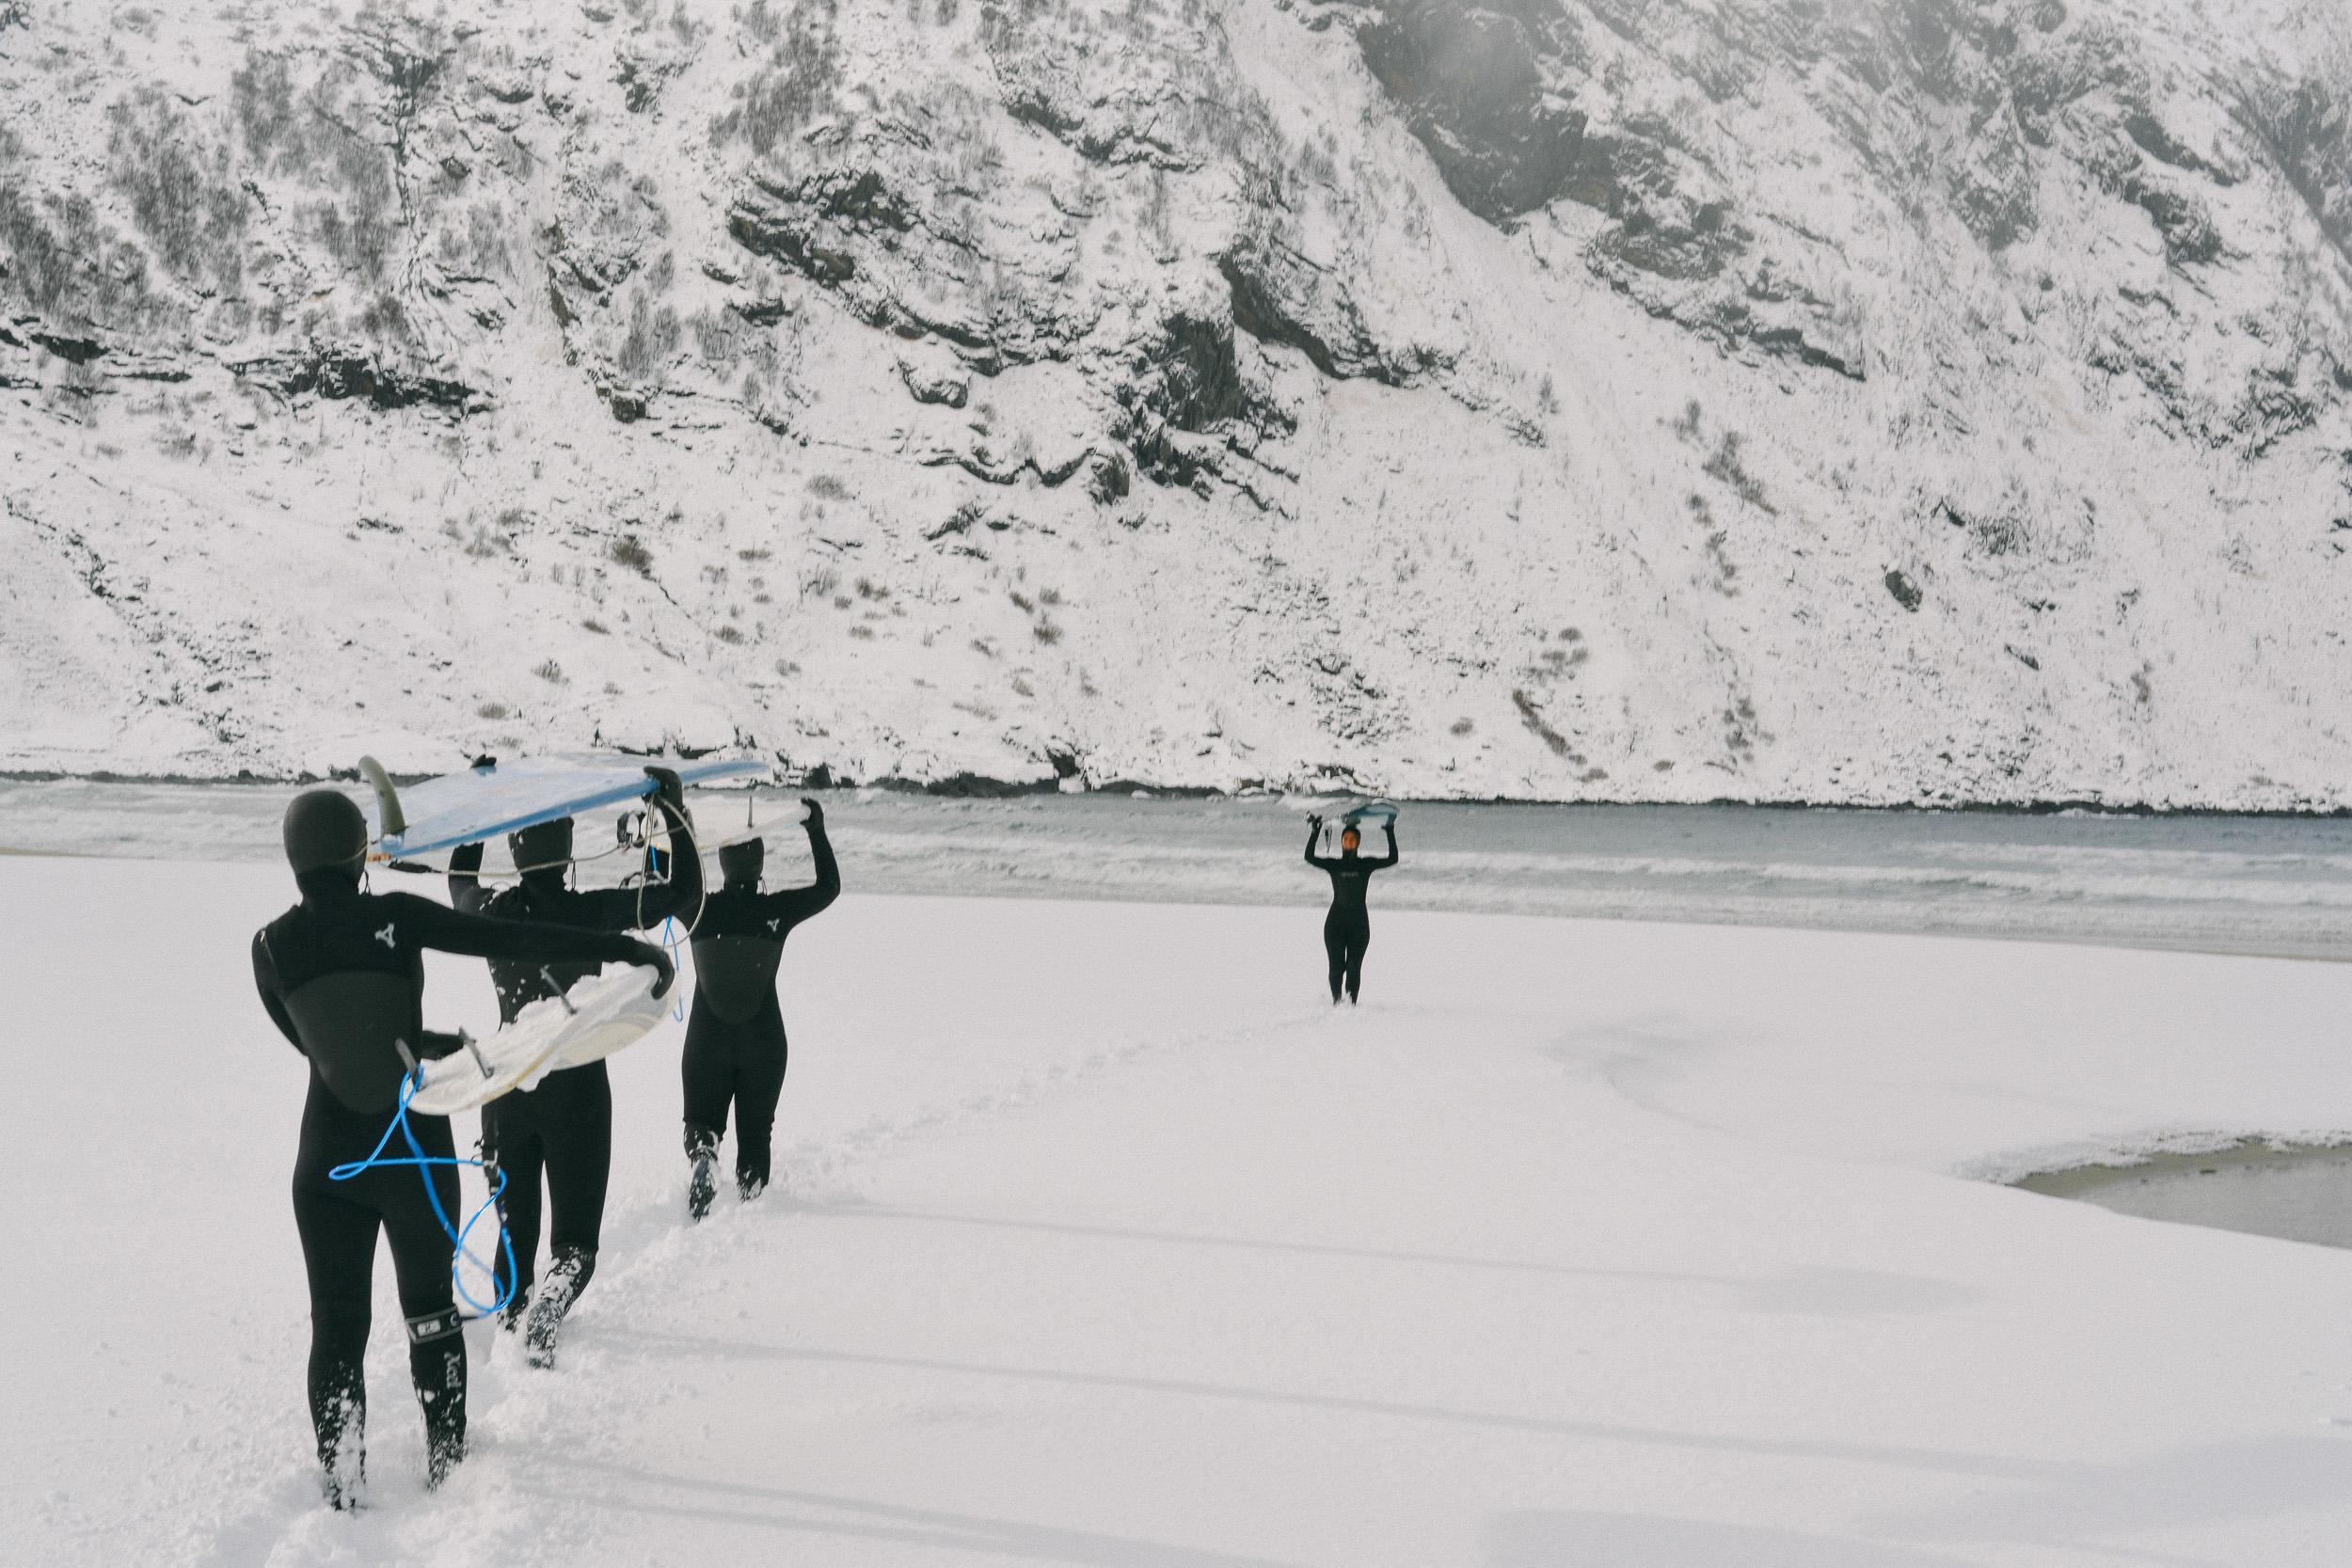 Christian-Surfers-Norway-2.jpg